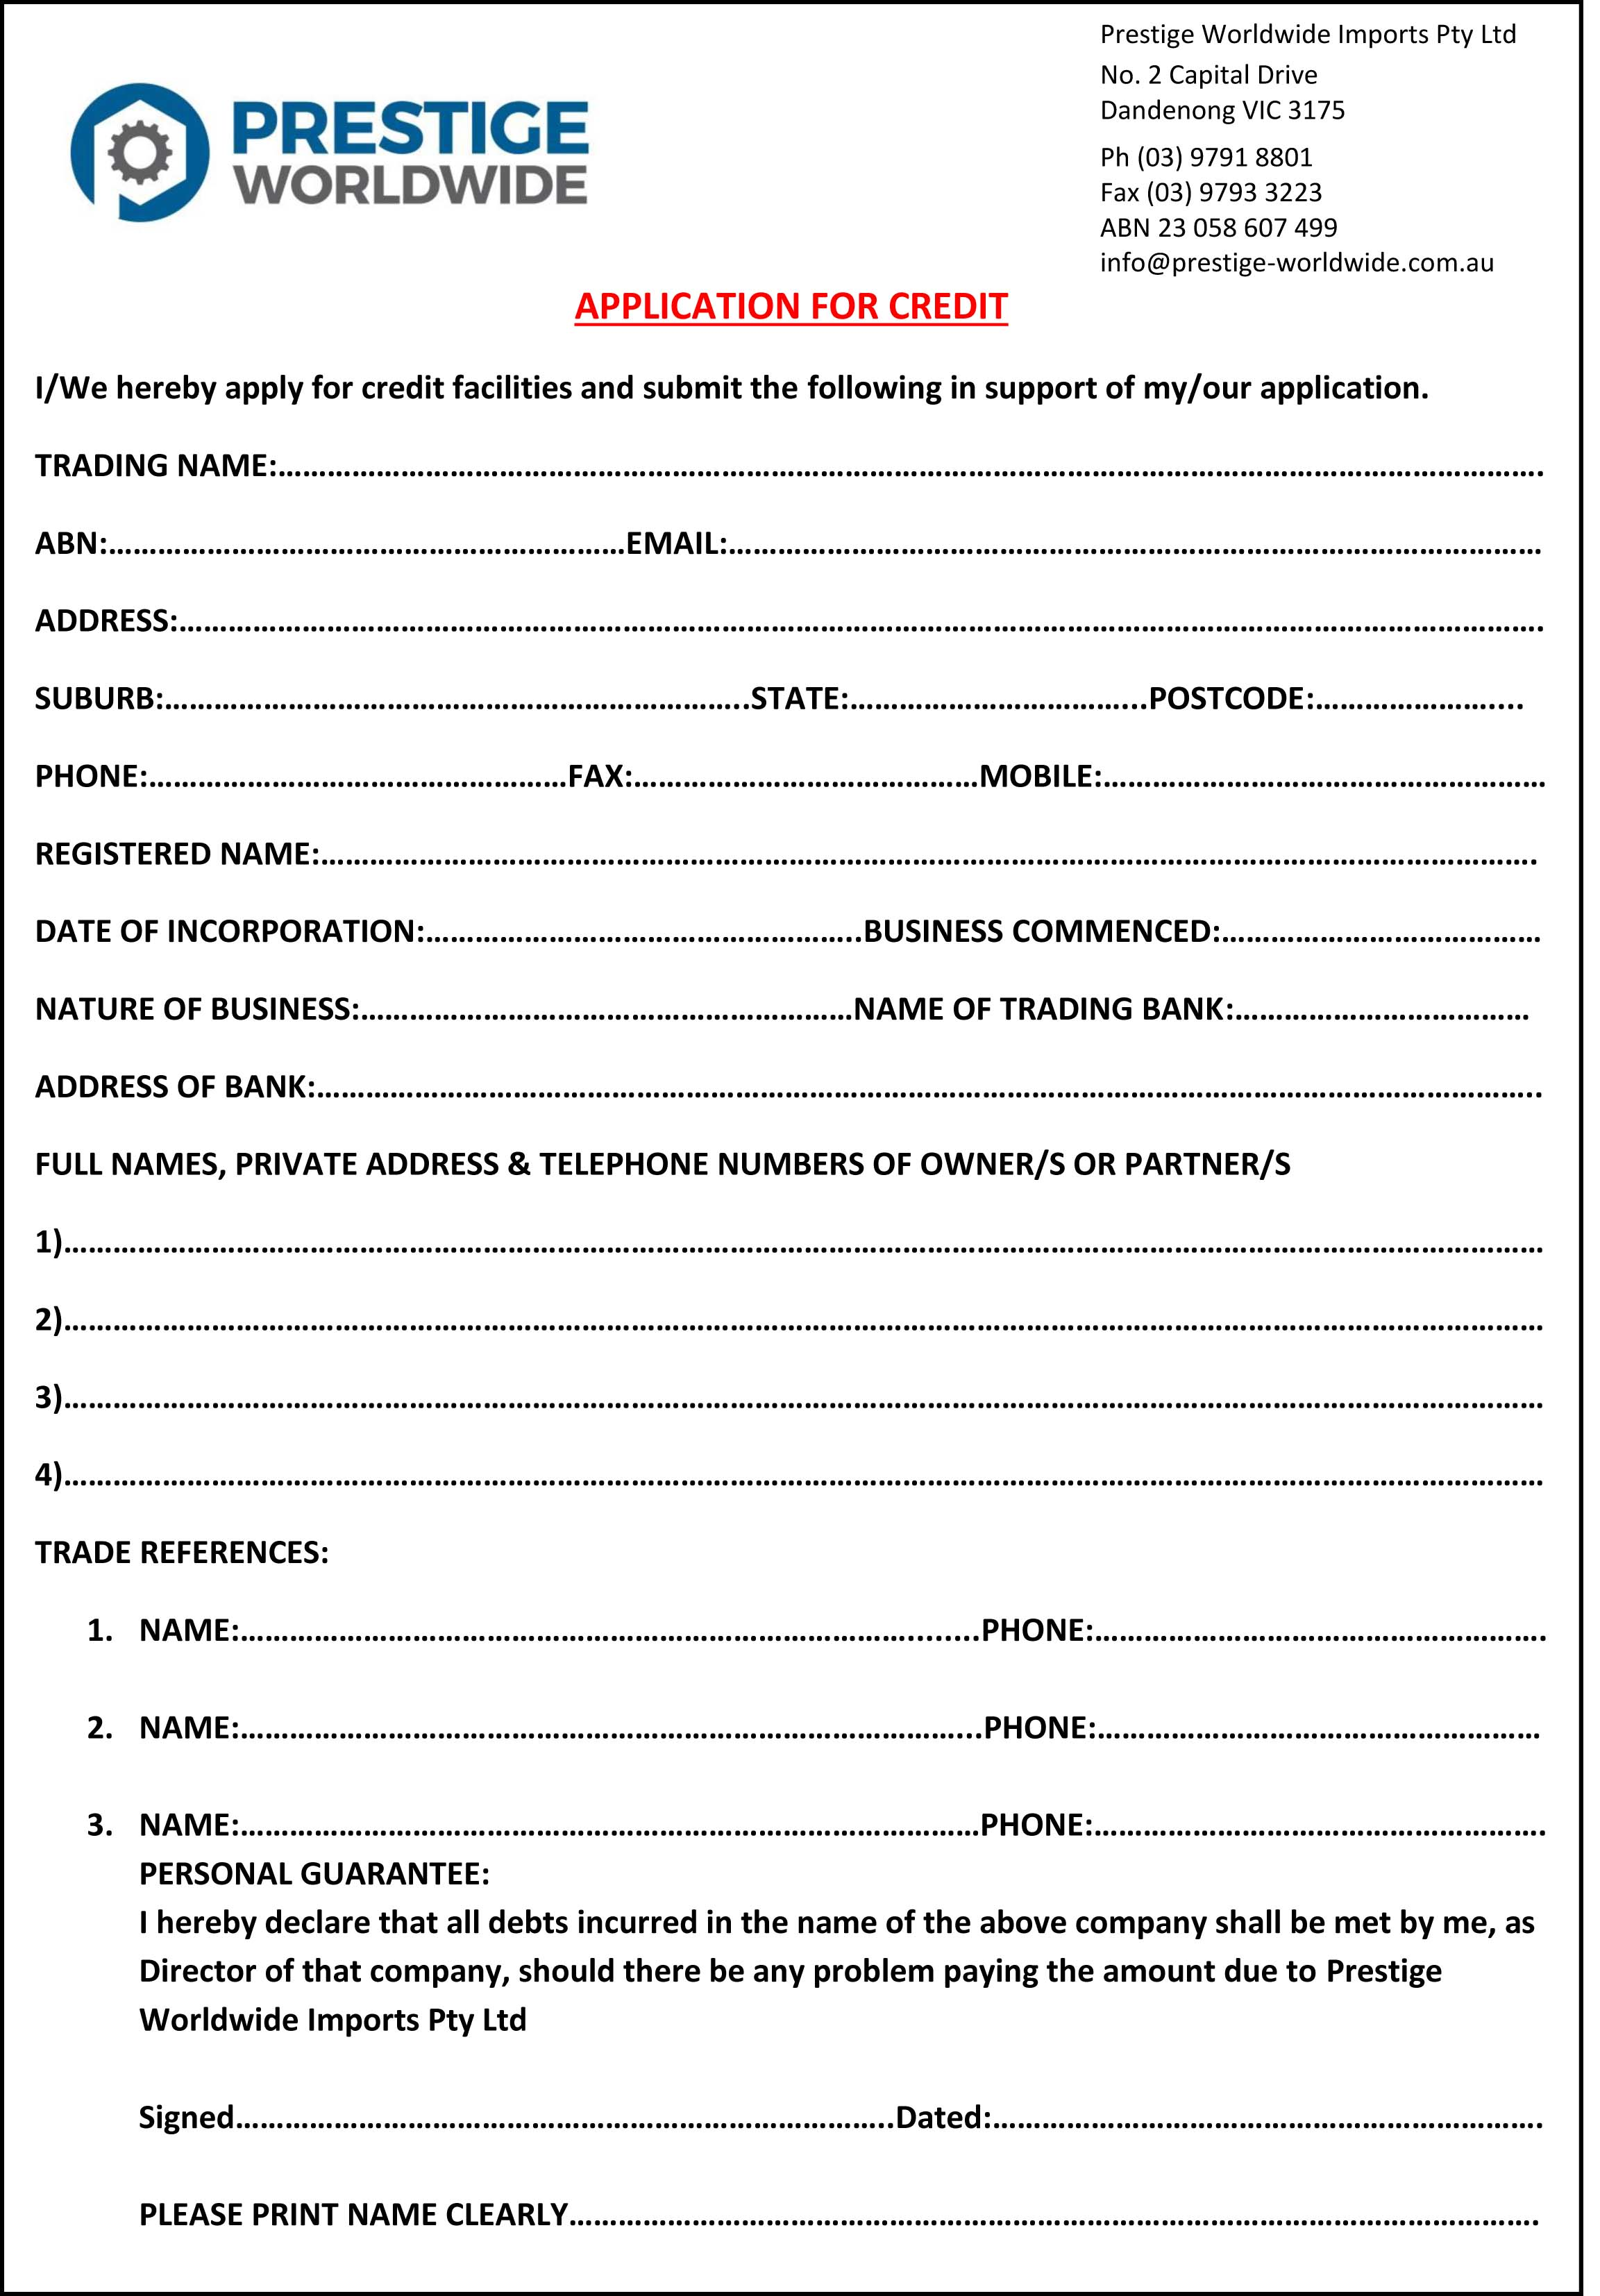 pwi-credit-application-form-2-.jpg